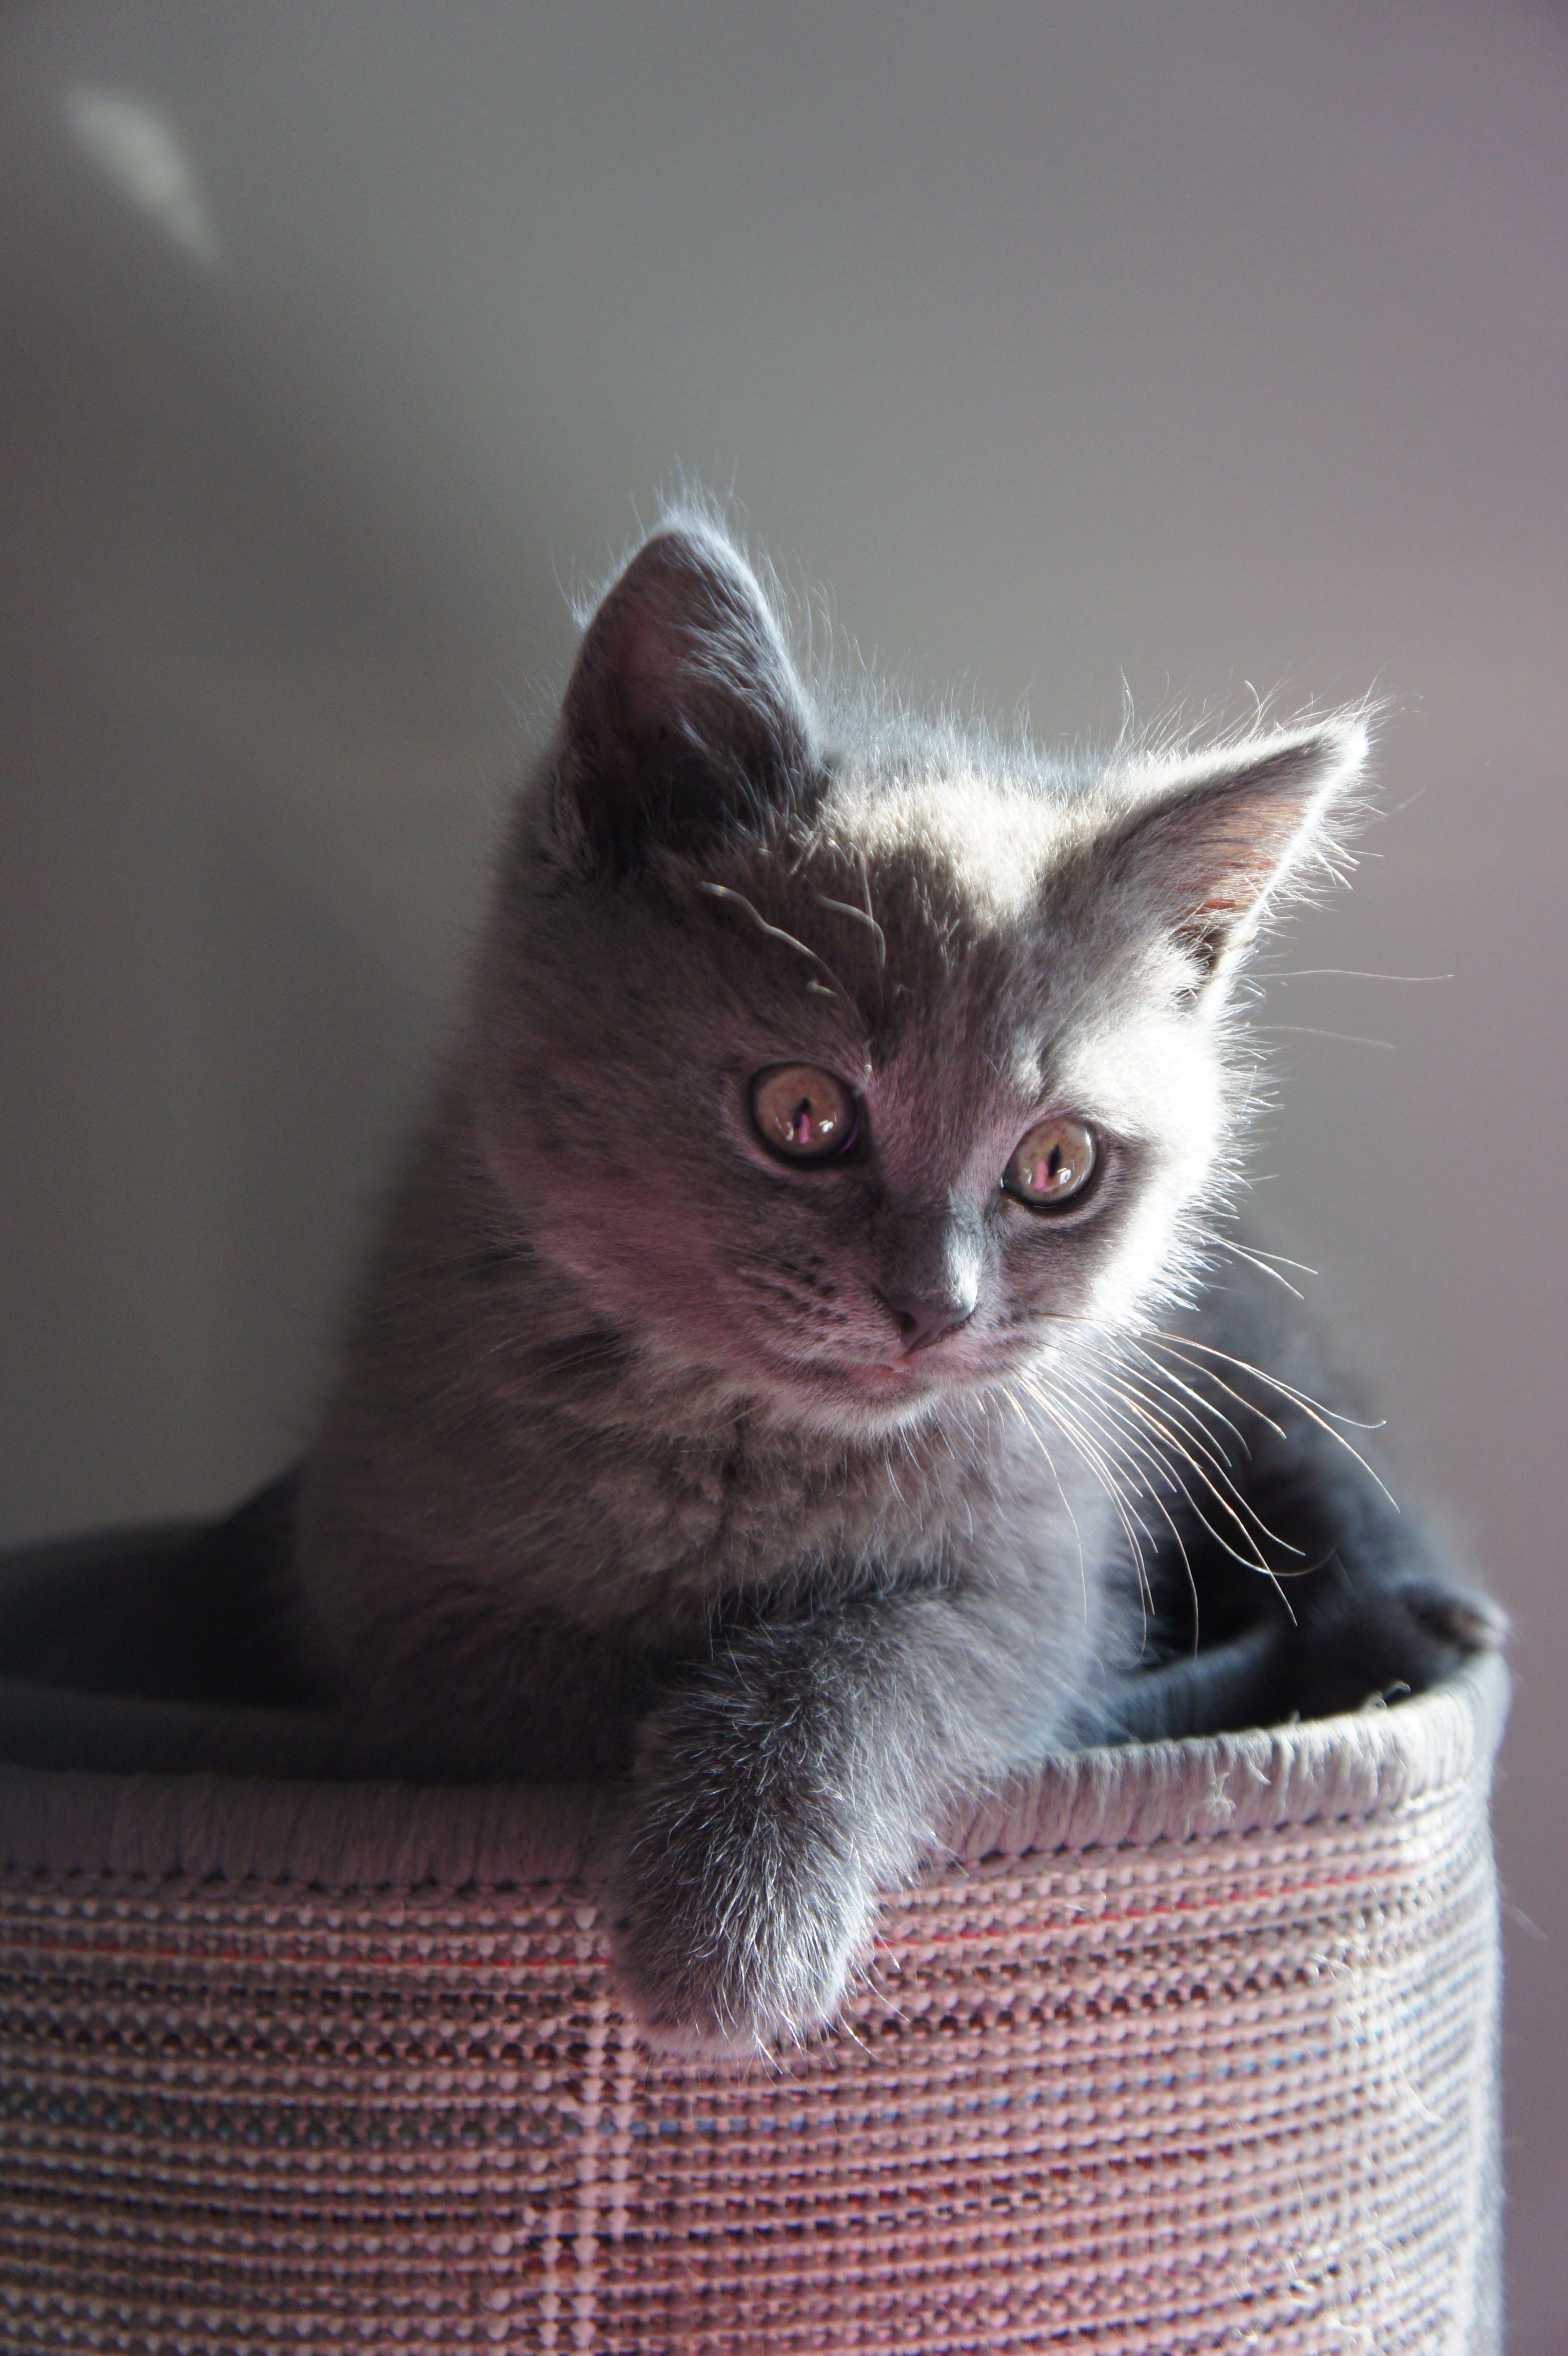 Fotos de stock gratuitas de animal, bote, gato